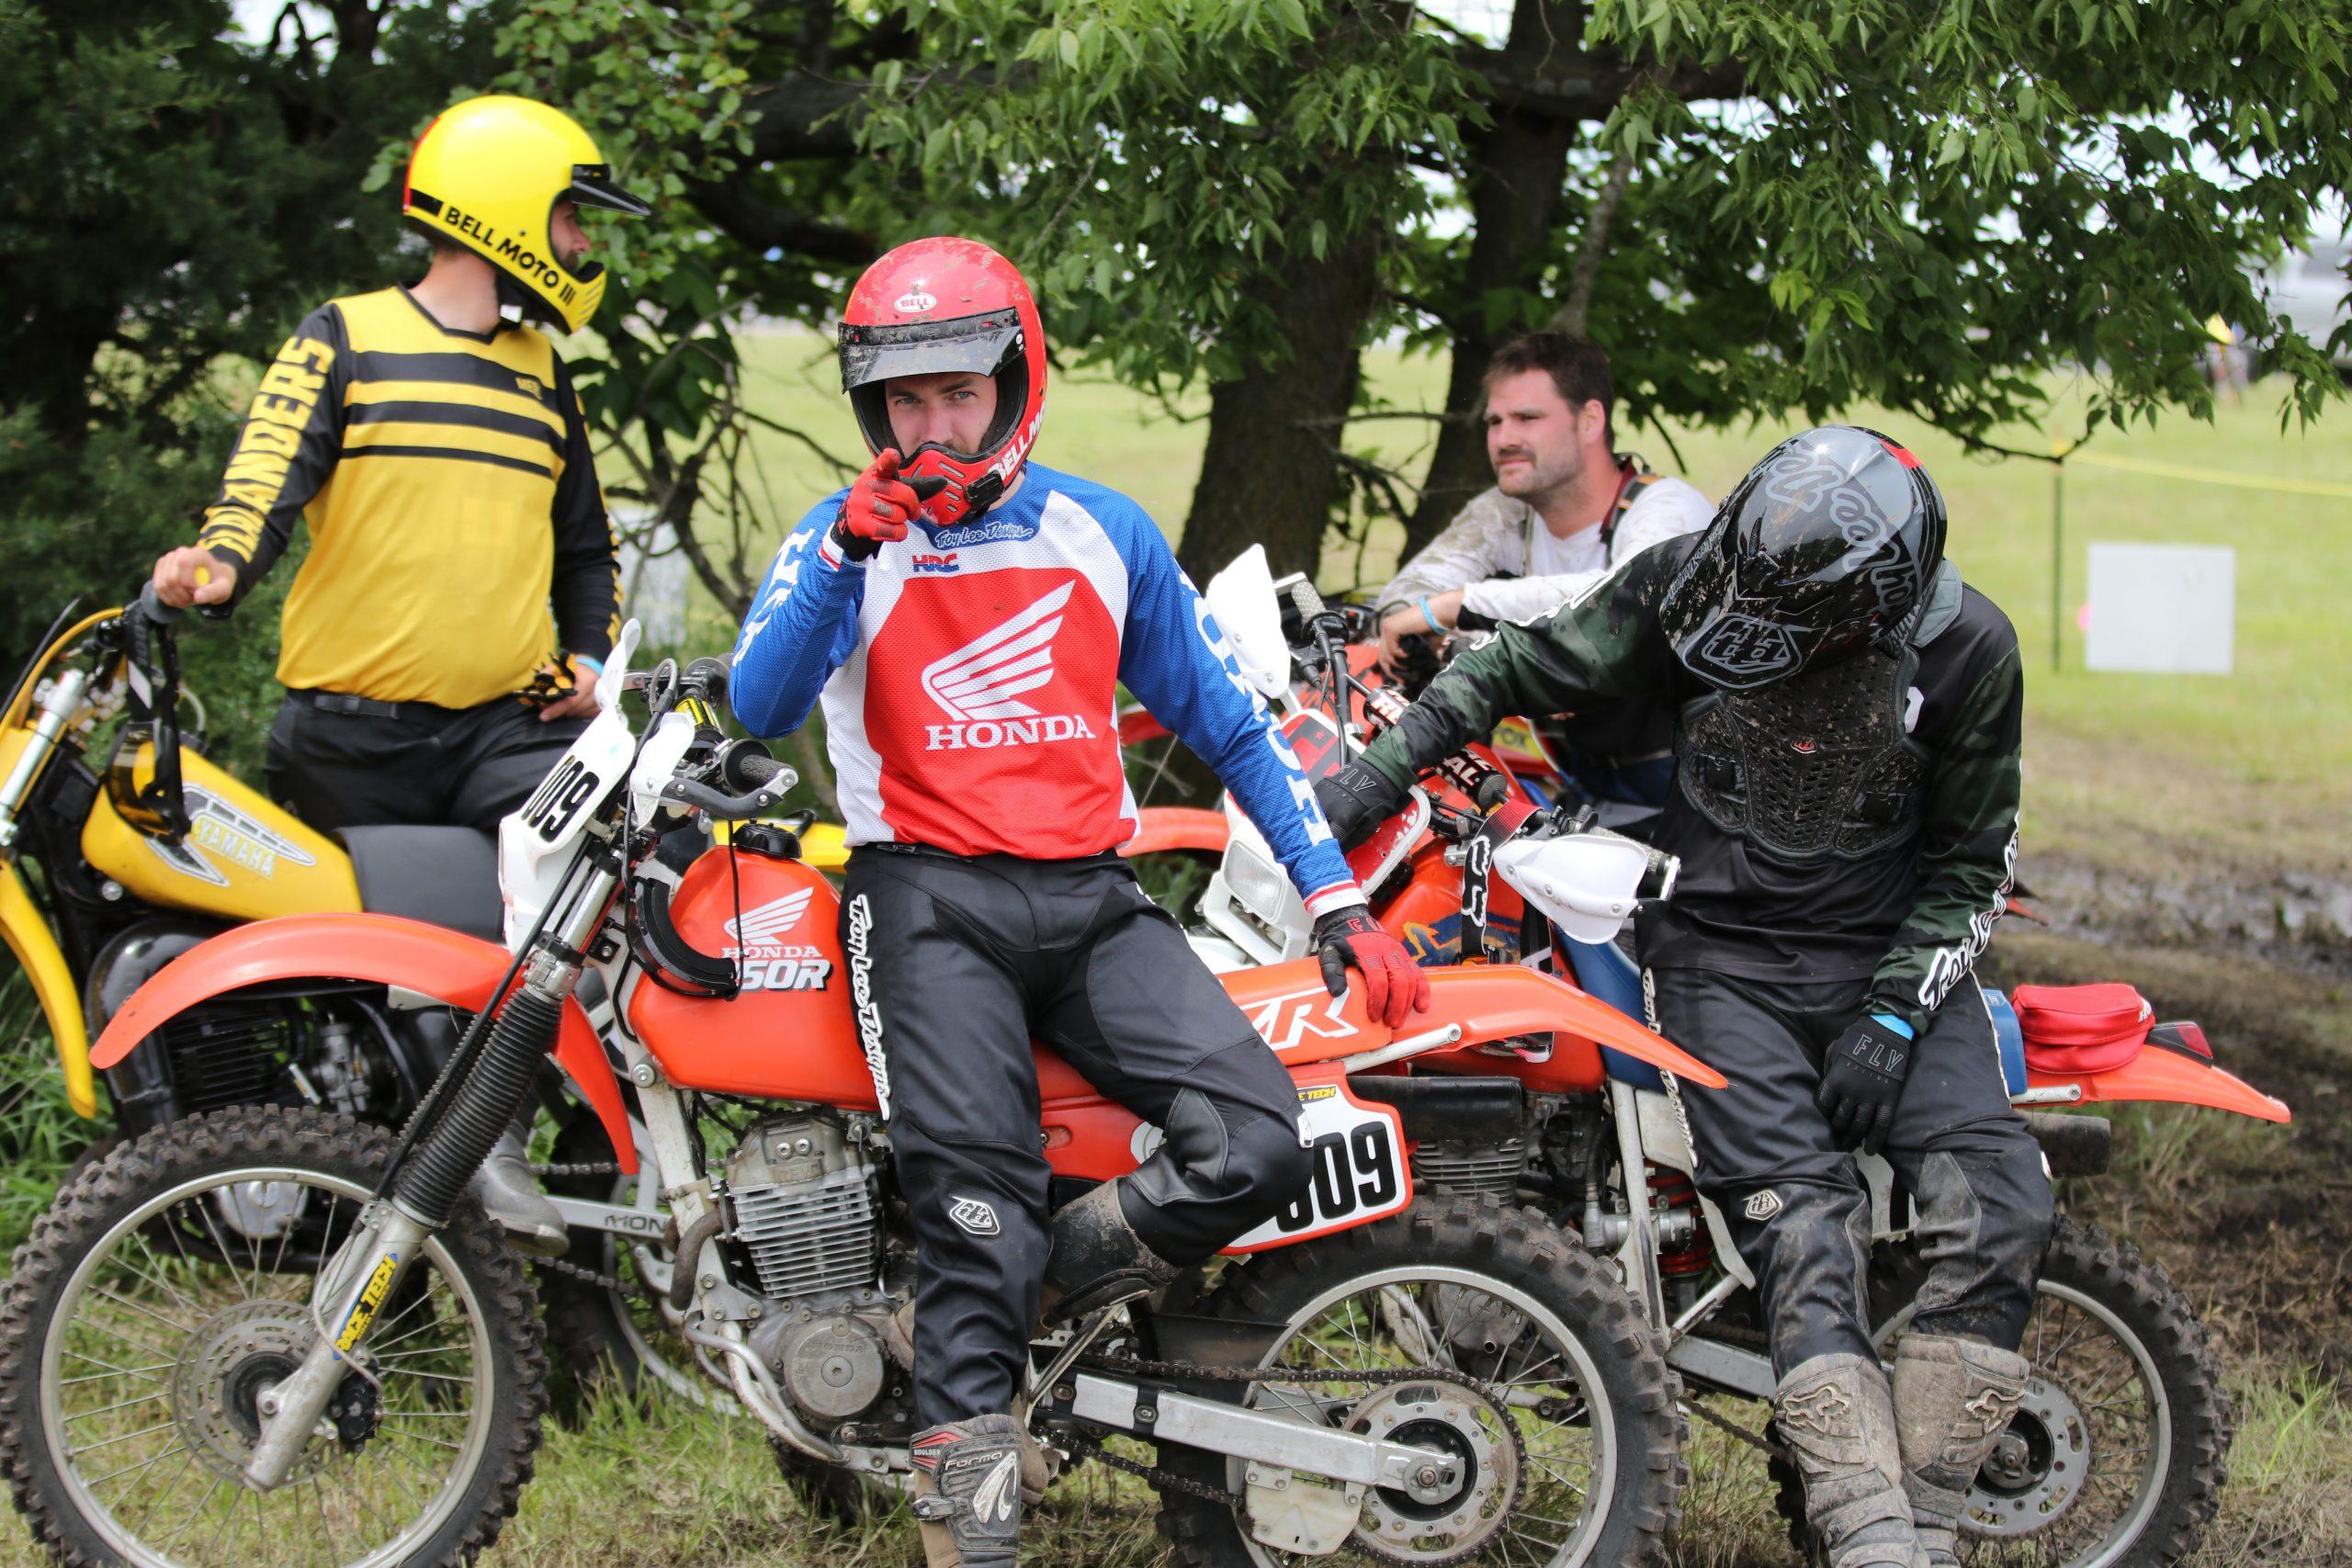 heartland motofest Kyle Smith flatlanders waiting for moto